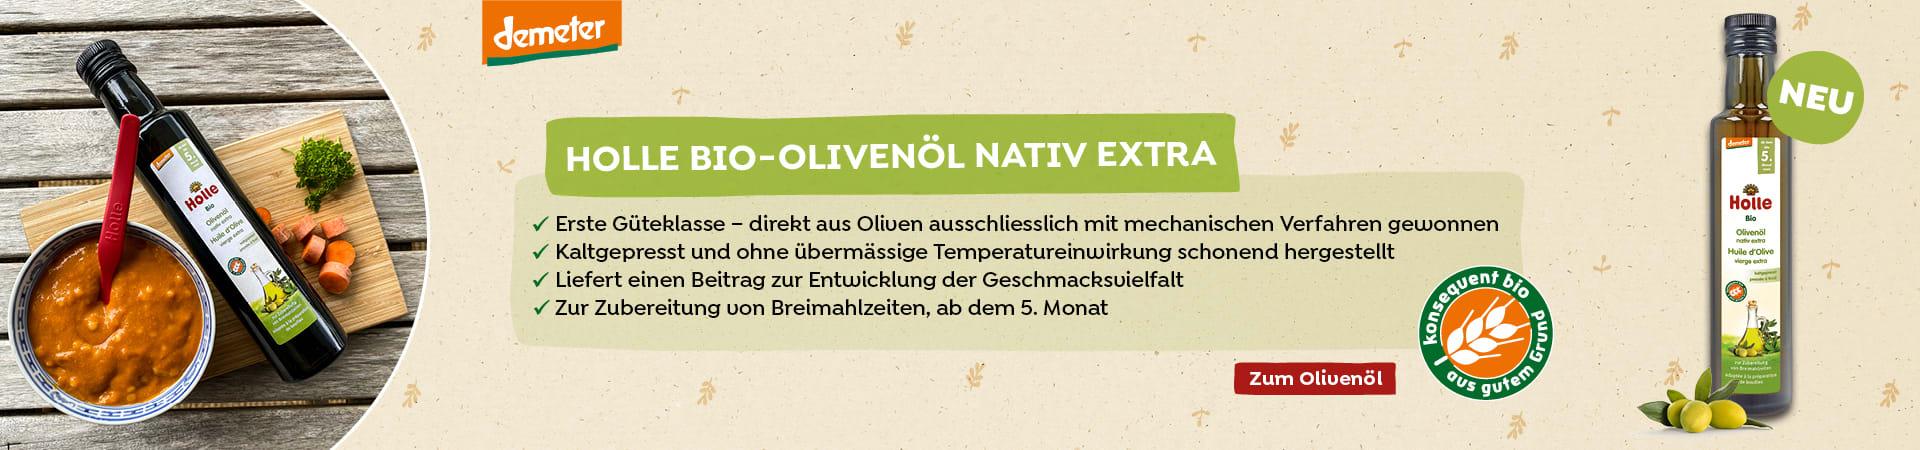 Neu im Shop: Bio-Olivenöl nativ extra, ab dem 5. Monat (250ml)